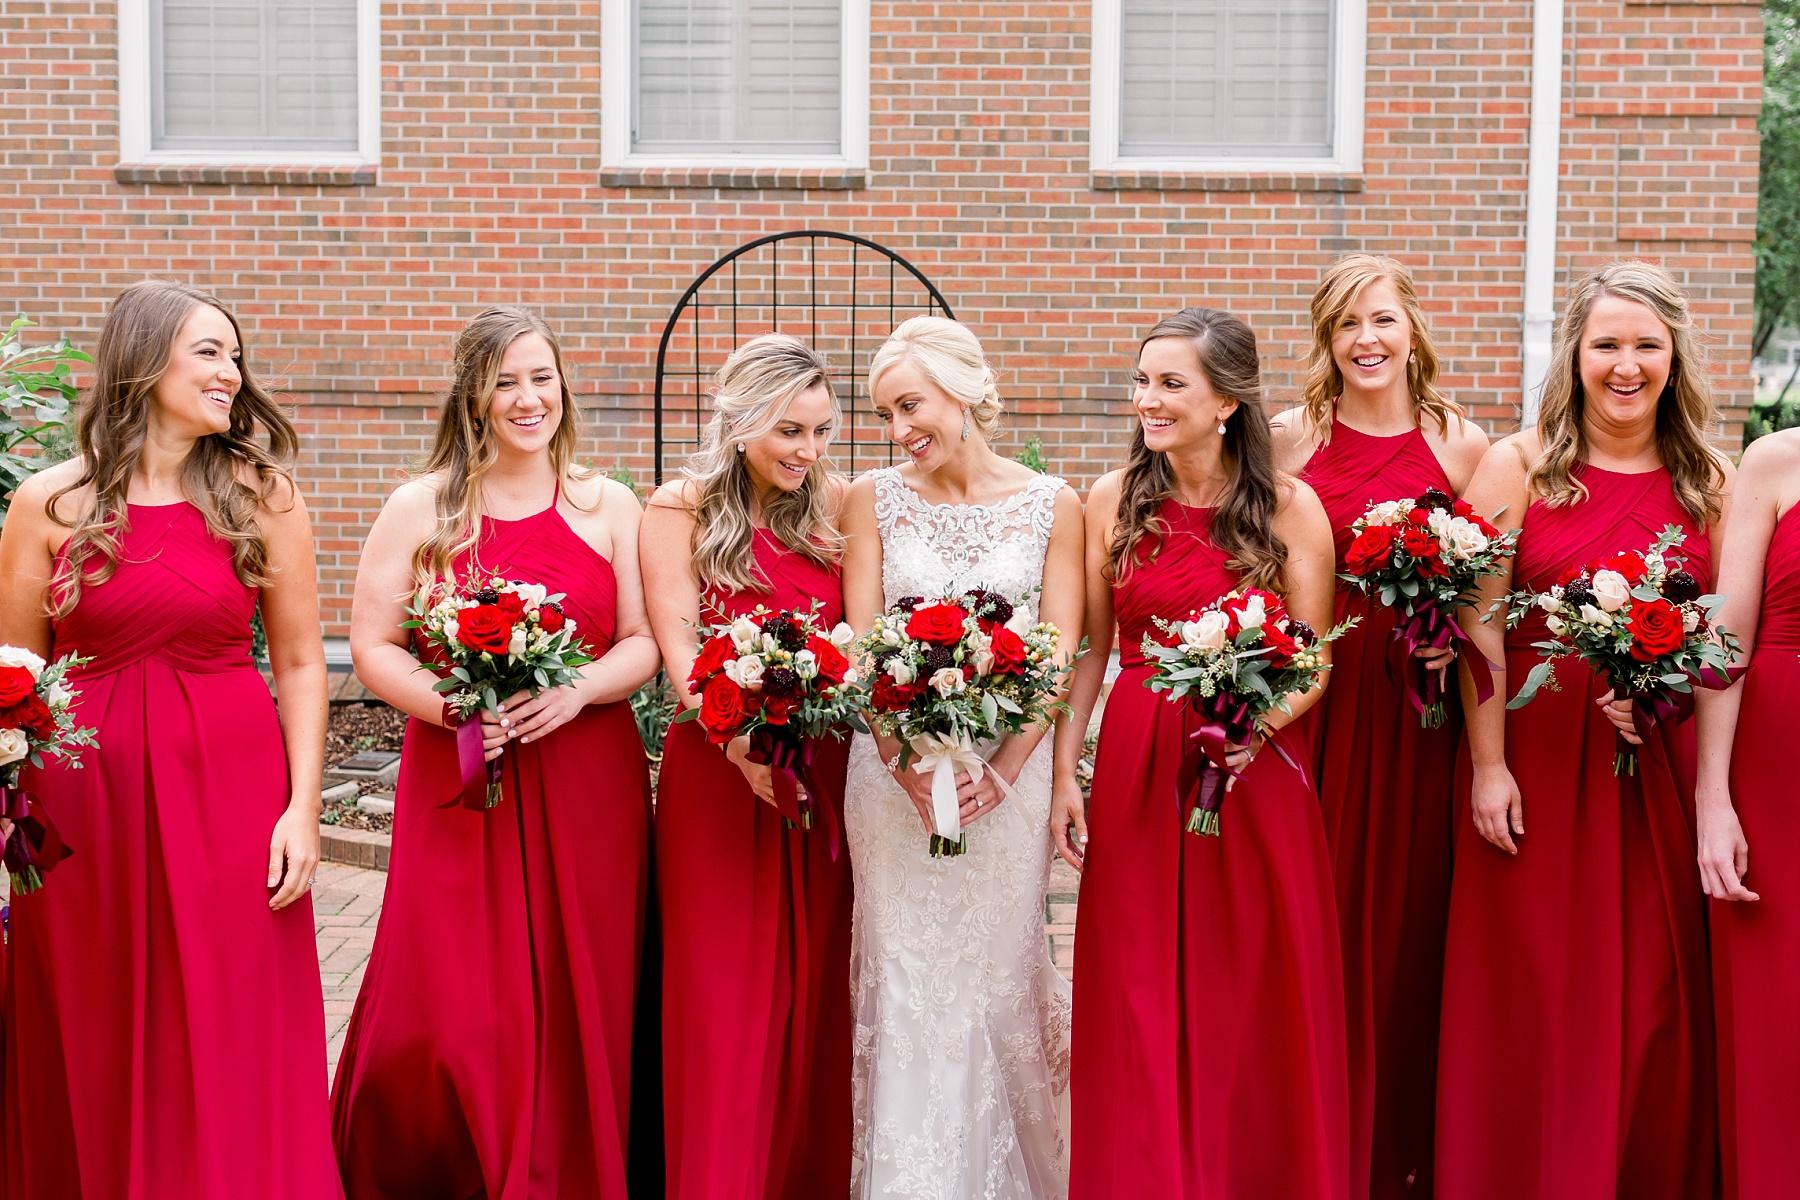 midwest-adventurous-wedding-photographer-elizabeth-ladean-photography-photo_4824.jpg